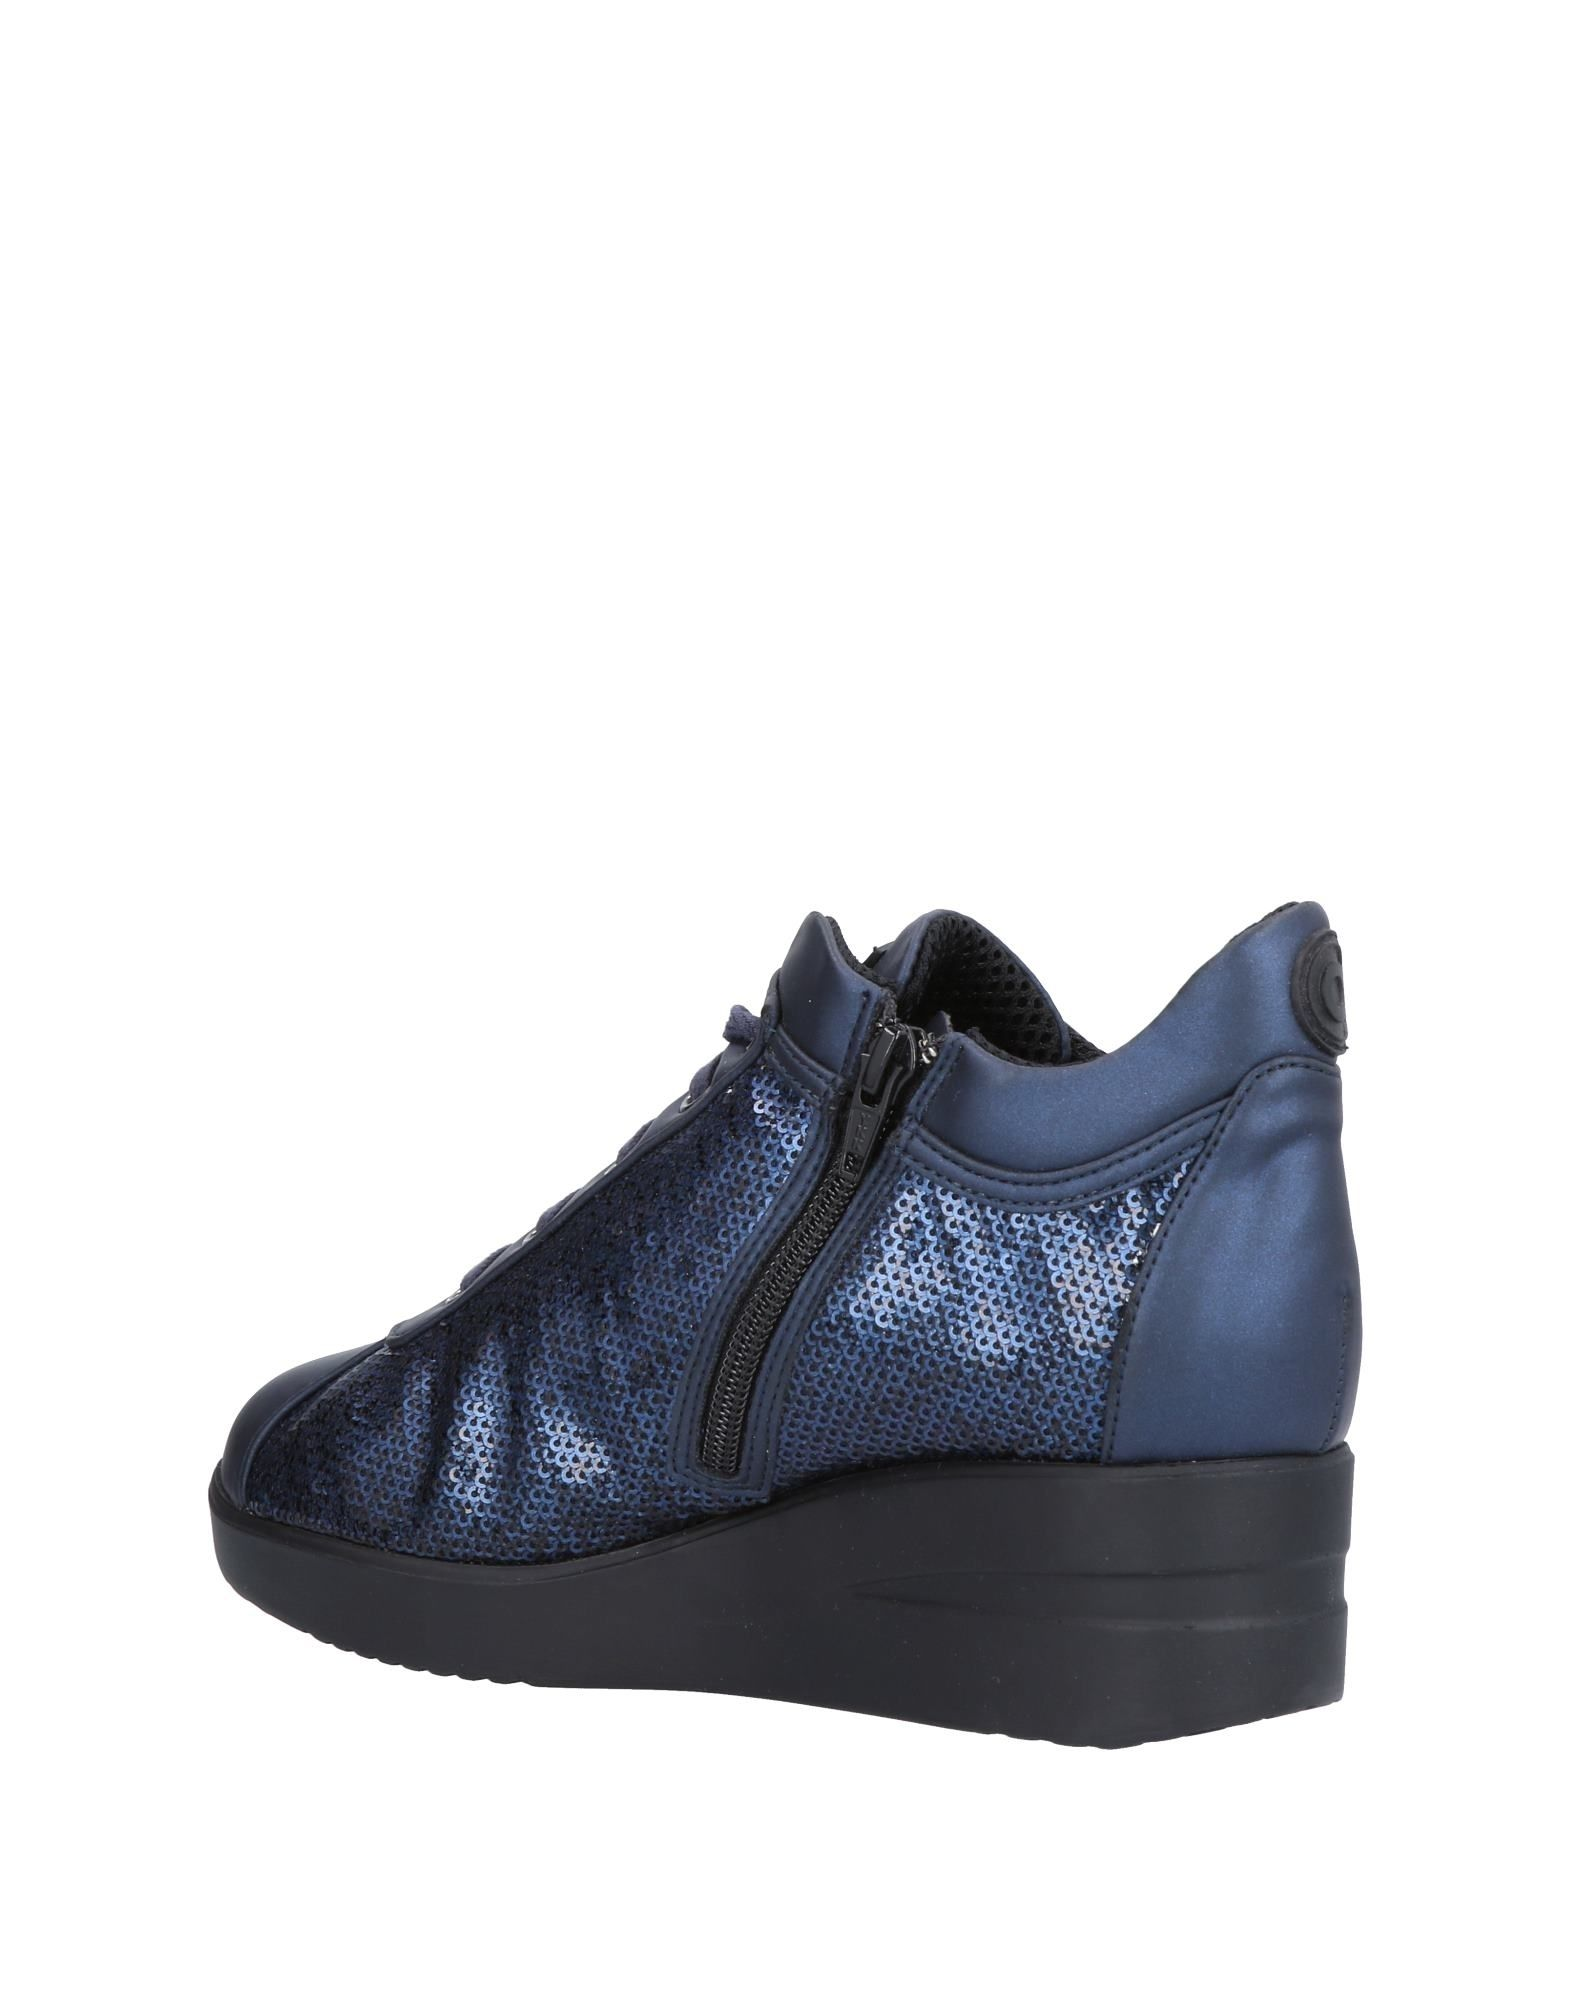 Agile By Rucoline Neue Sneakers Damen  11495685MF Neue Rucoline Schuhe 9d7ea5